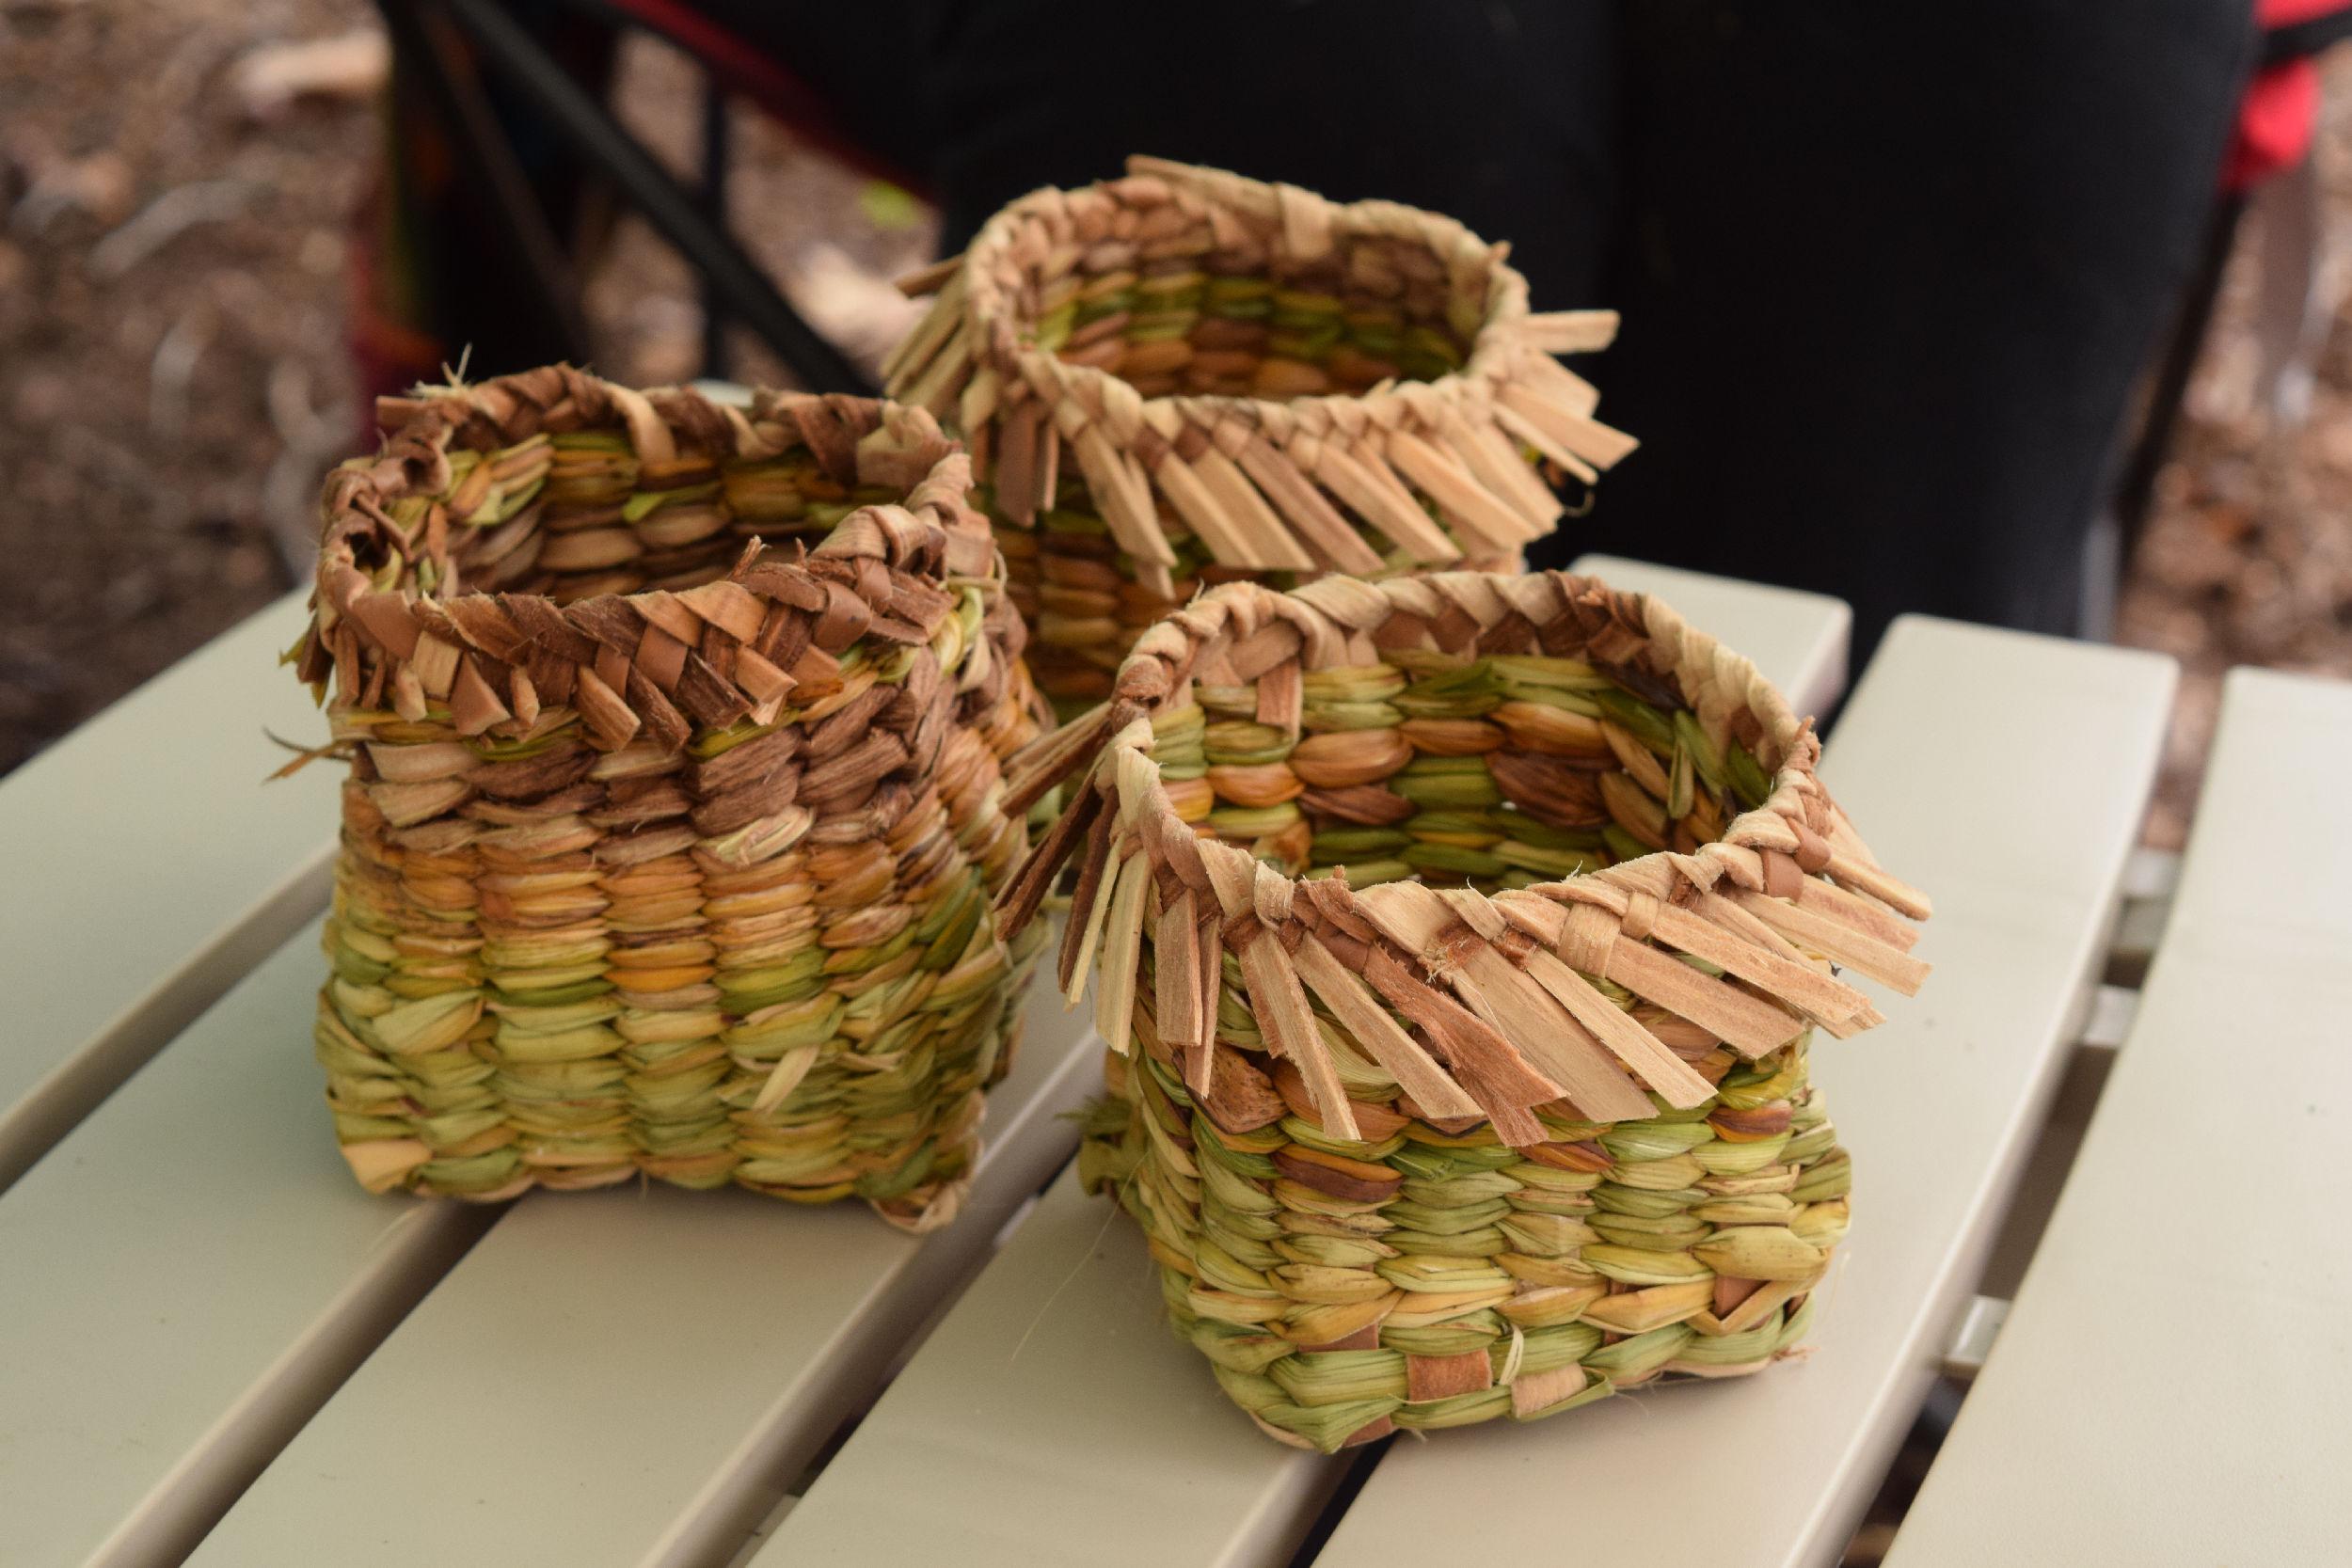 cattail and iris baskets